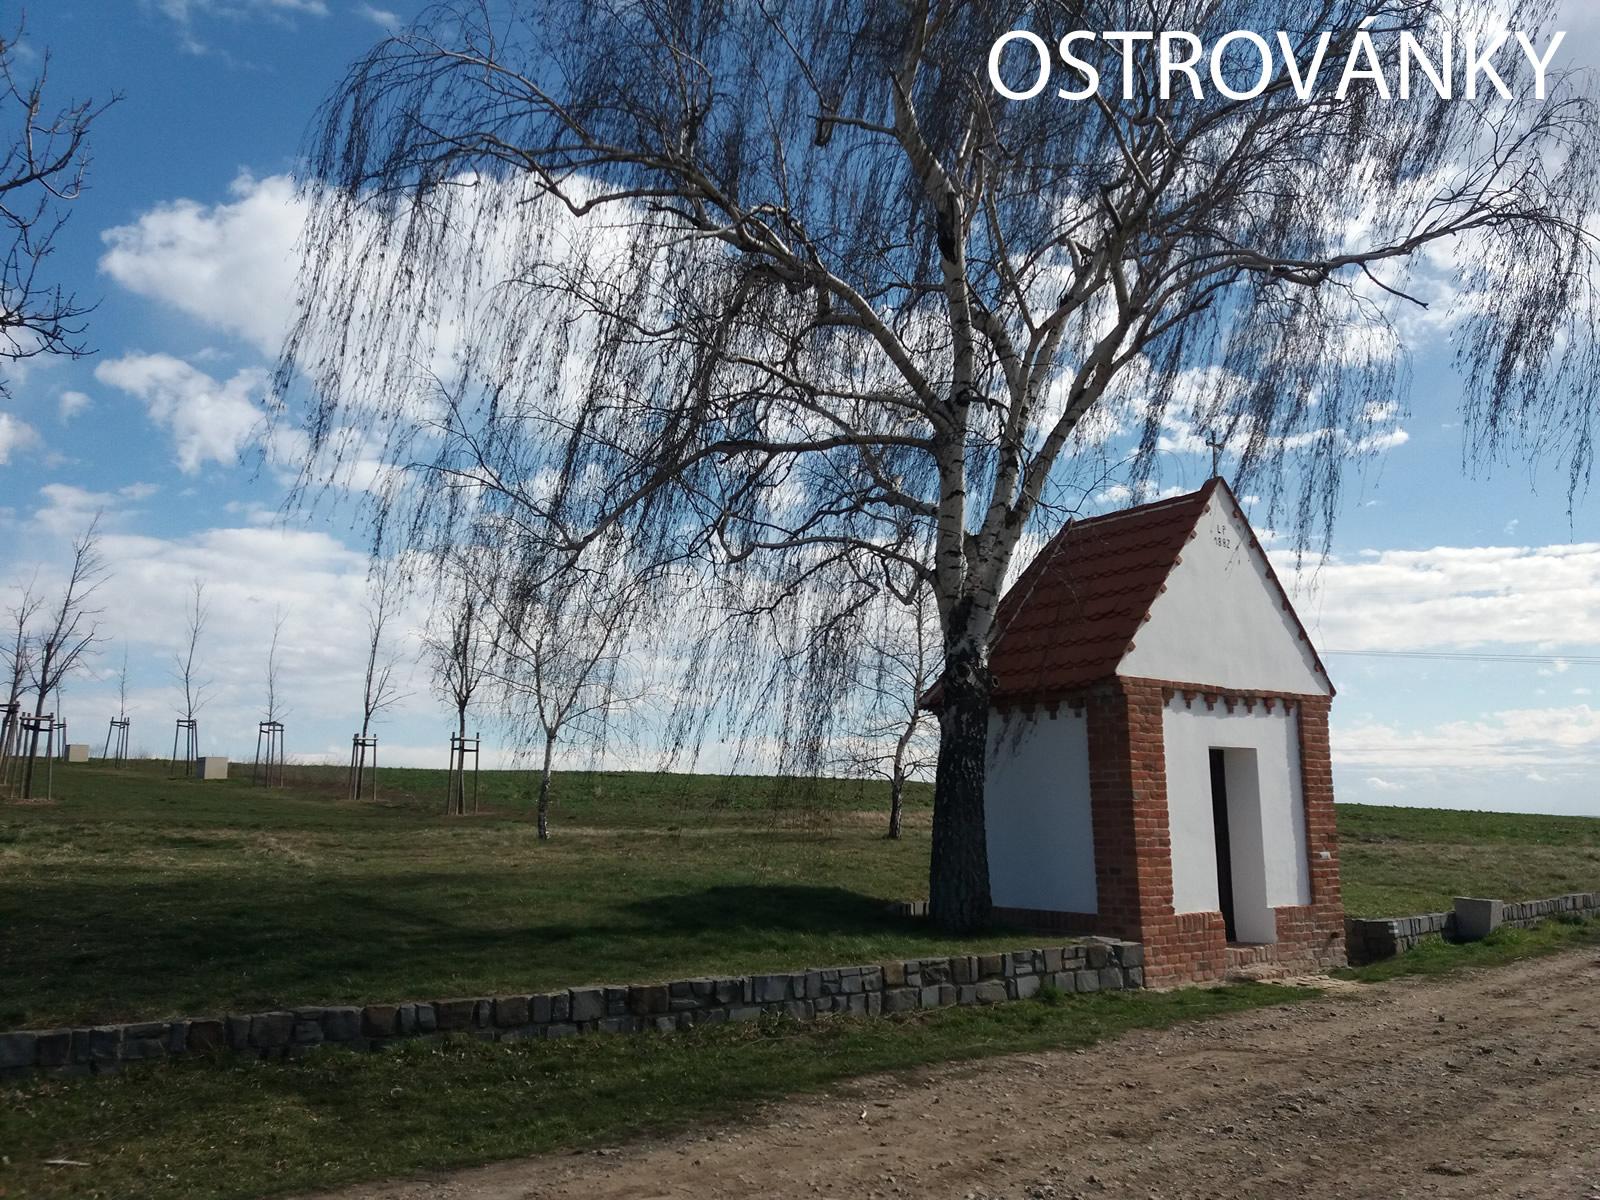 6-Ostrovanky1